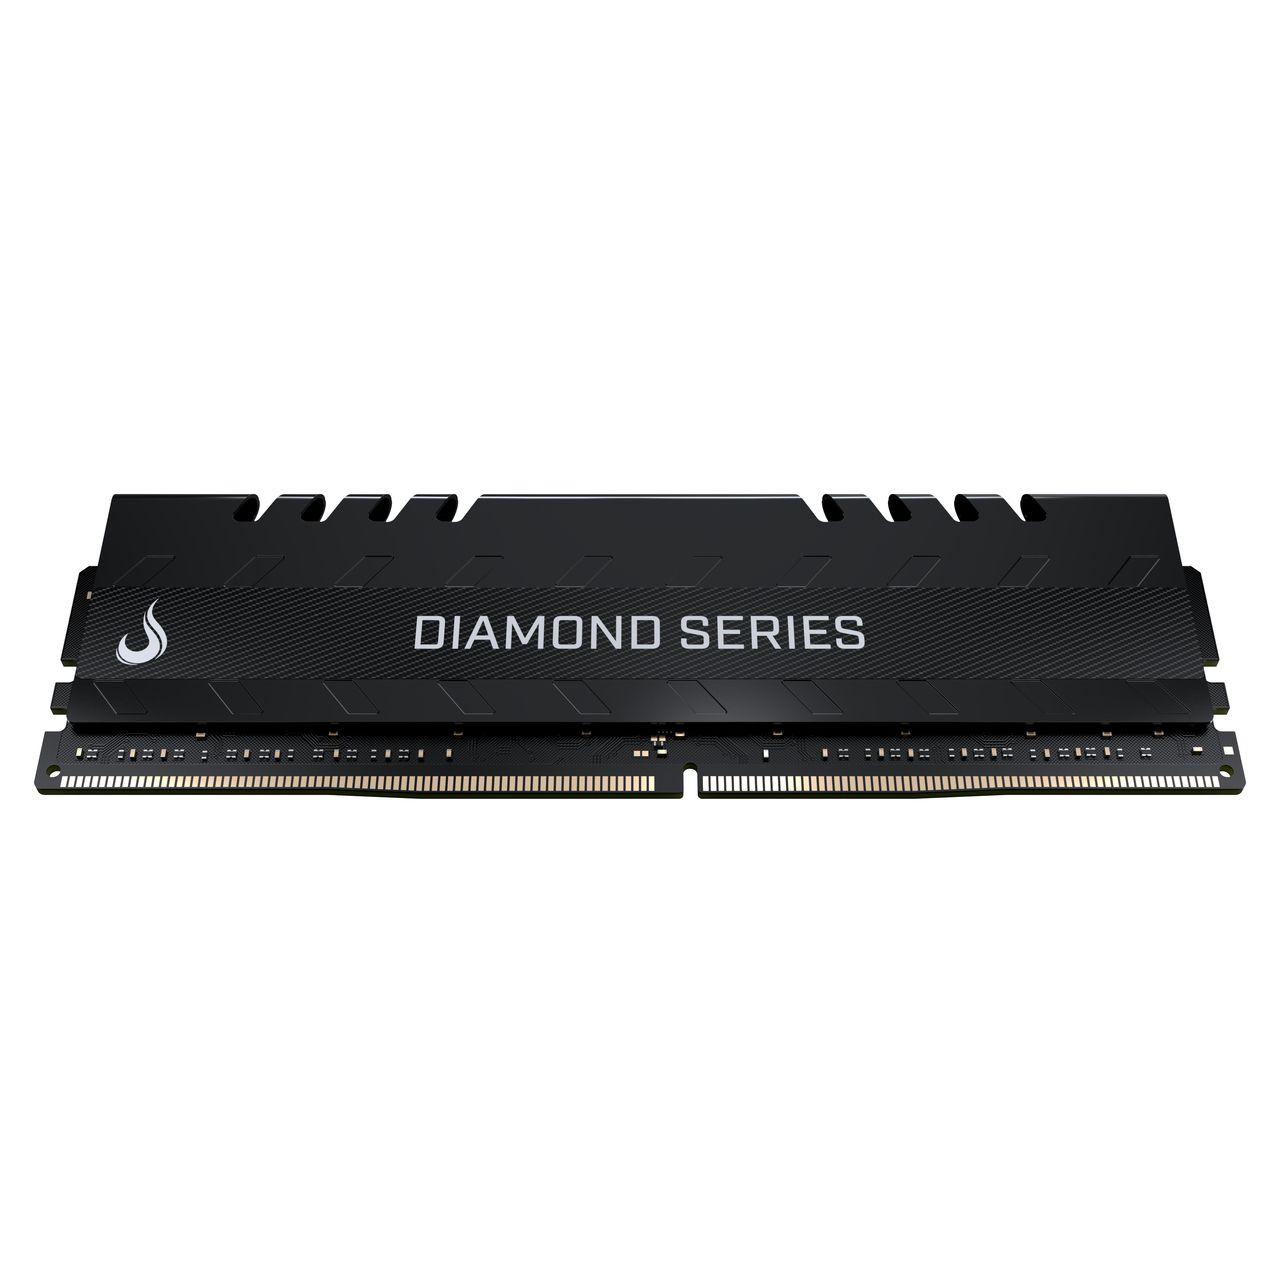 Memoria Ram DDR4 16GB 2400MHZ Diamond - RM-D4-16G-2400D BLACK  - Loja Rise Mode